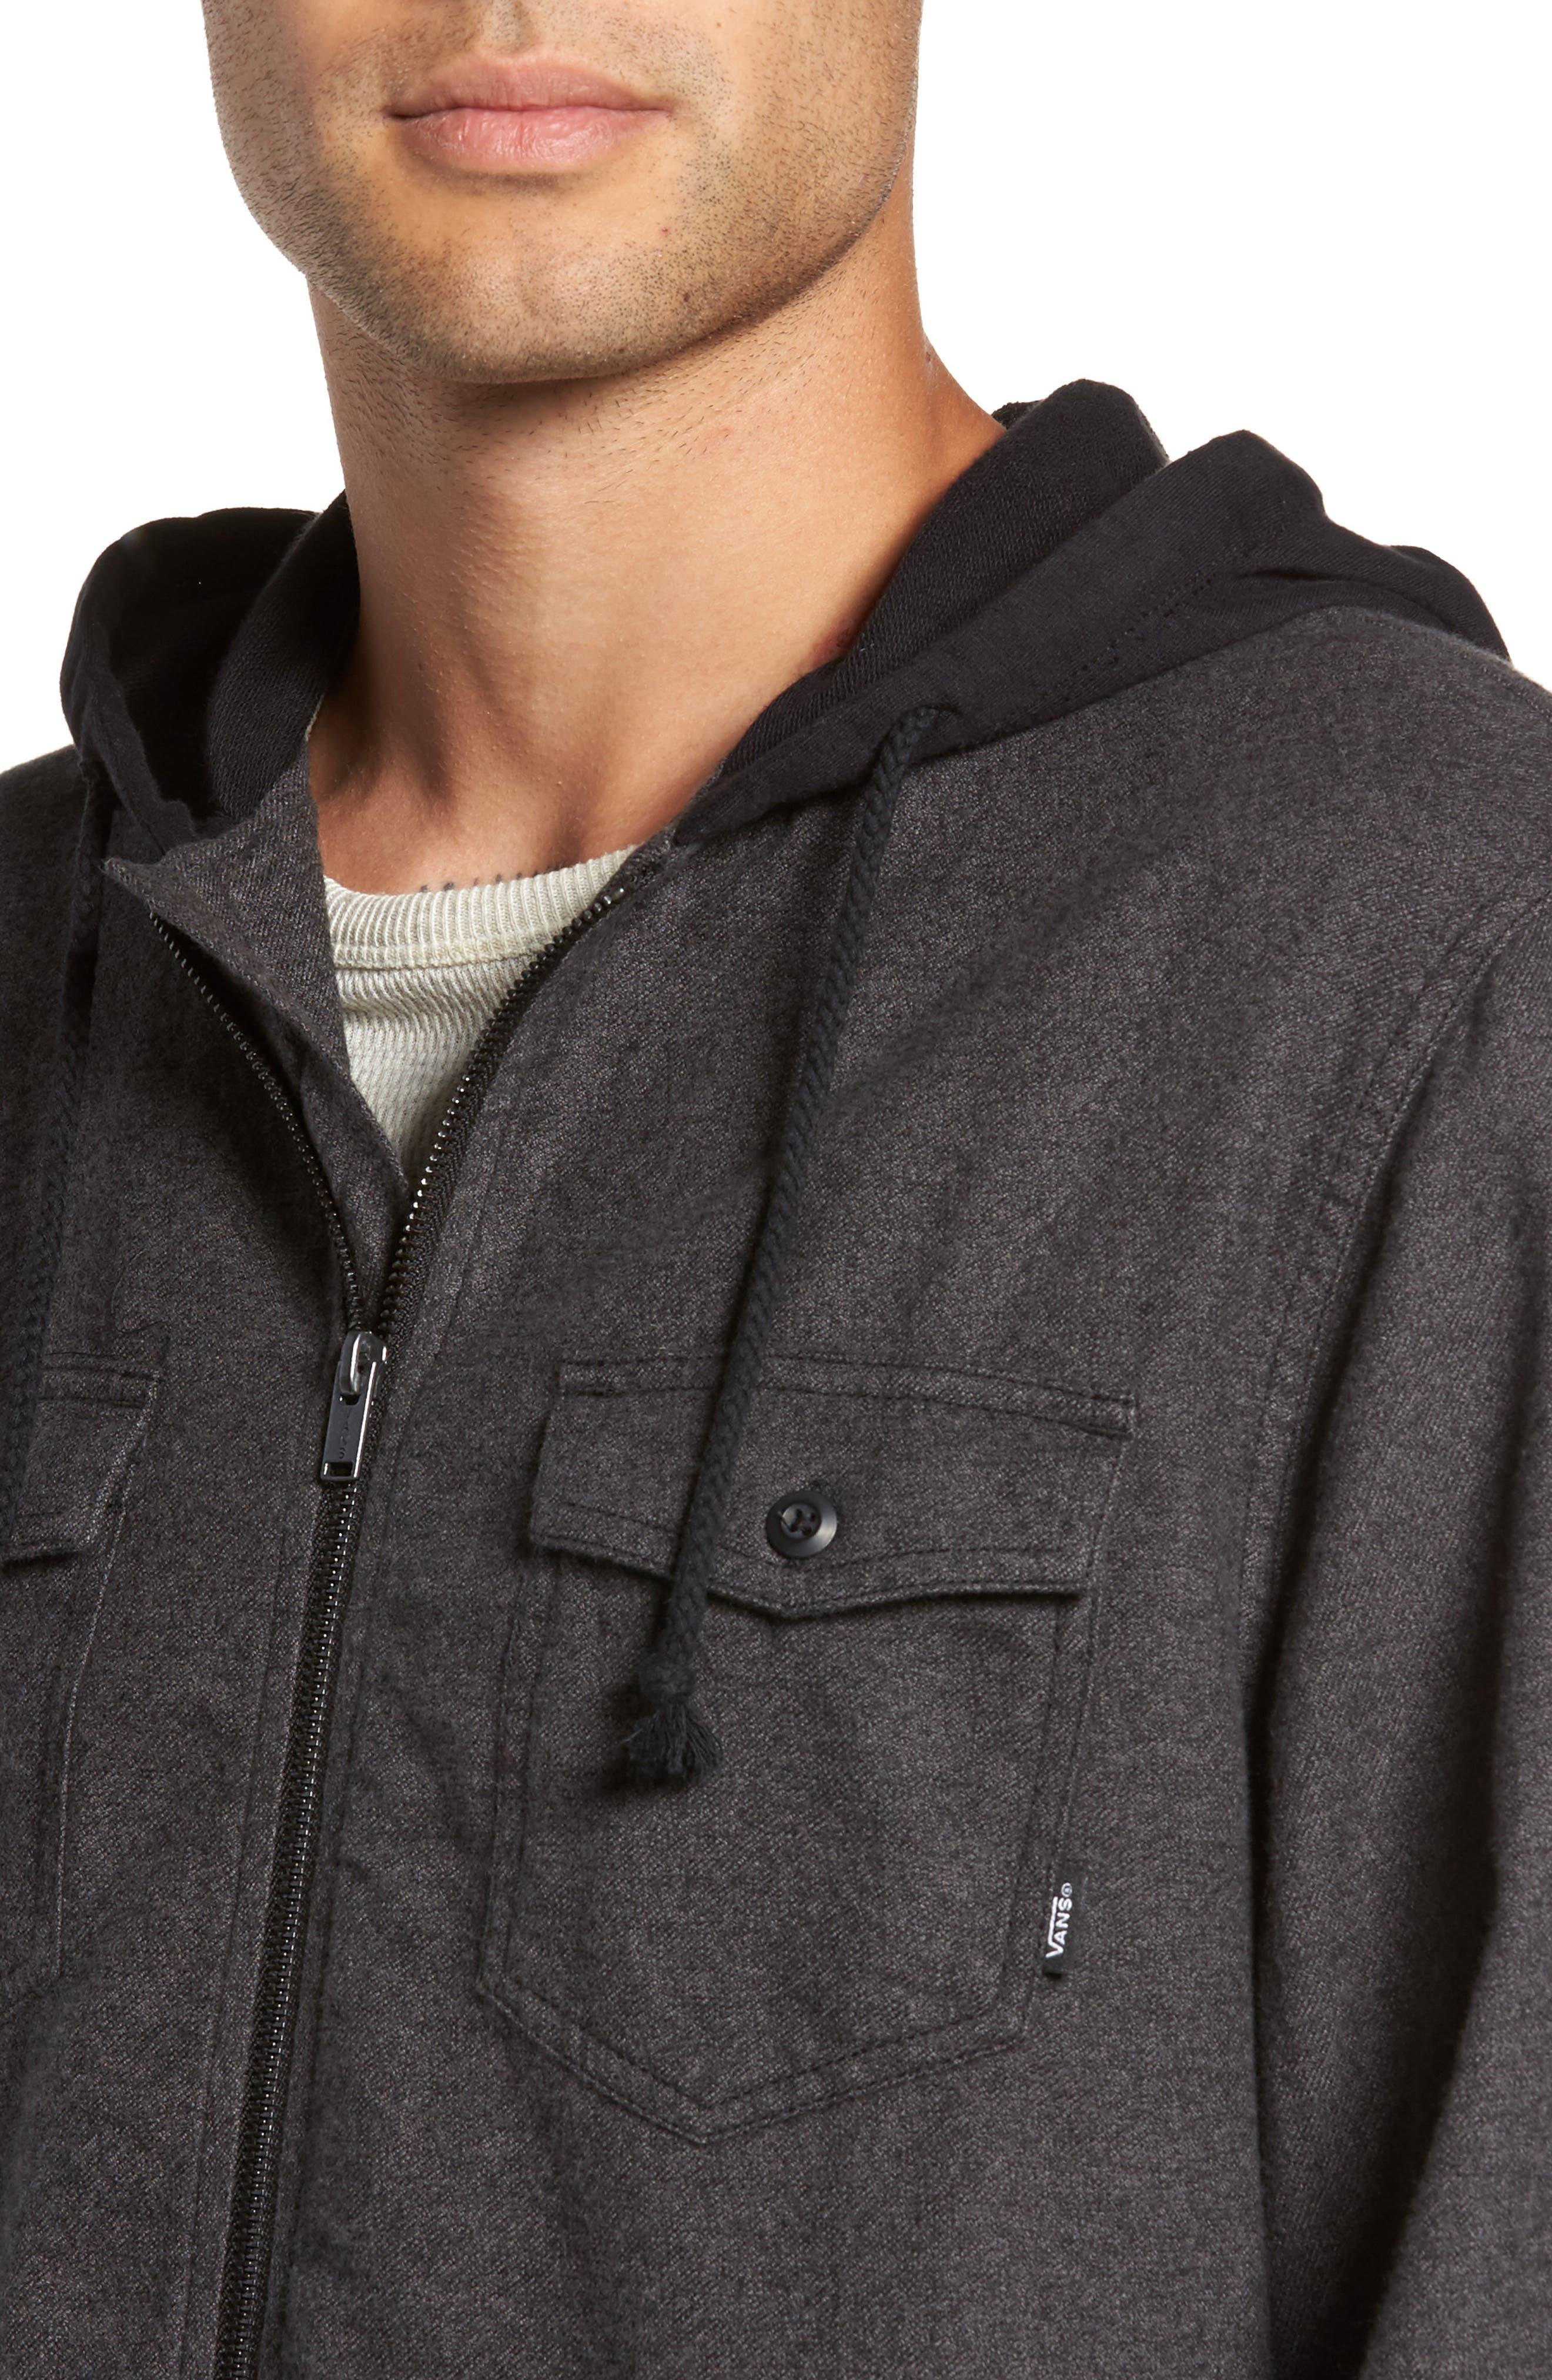 Never Mind Hooded Zip Shirt Jacket,                             Alternate thumbnail 4, color,                             001